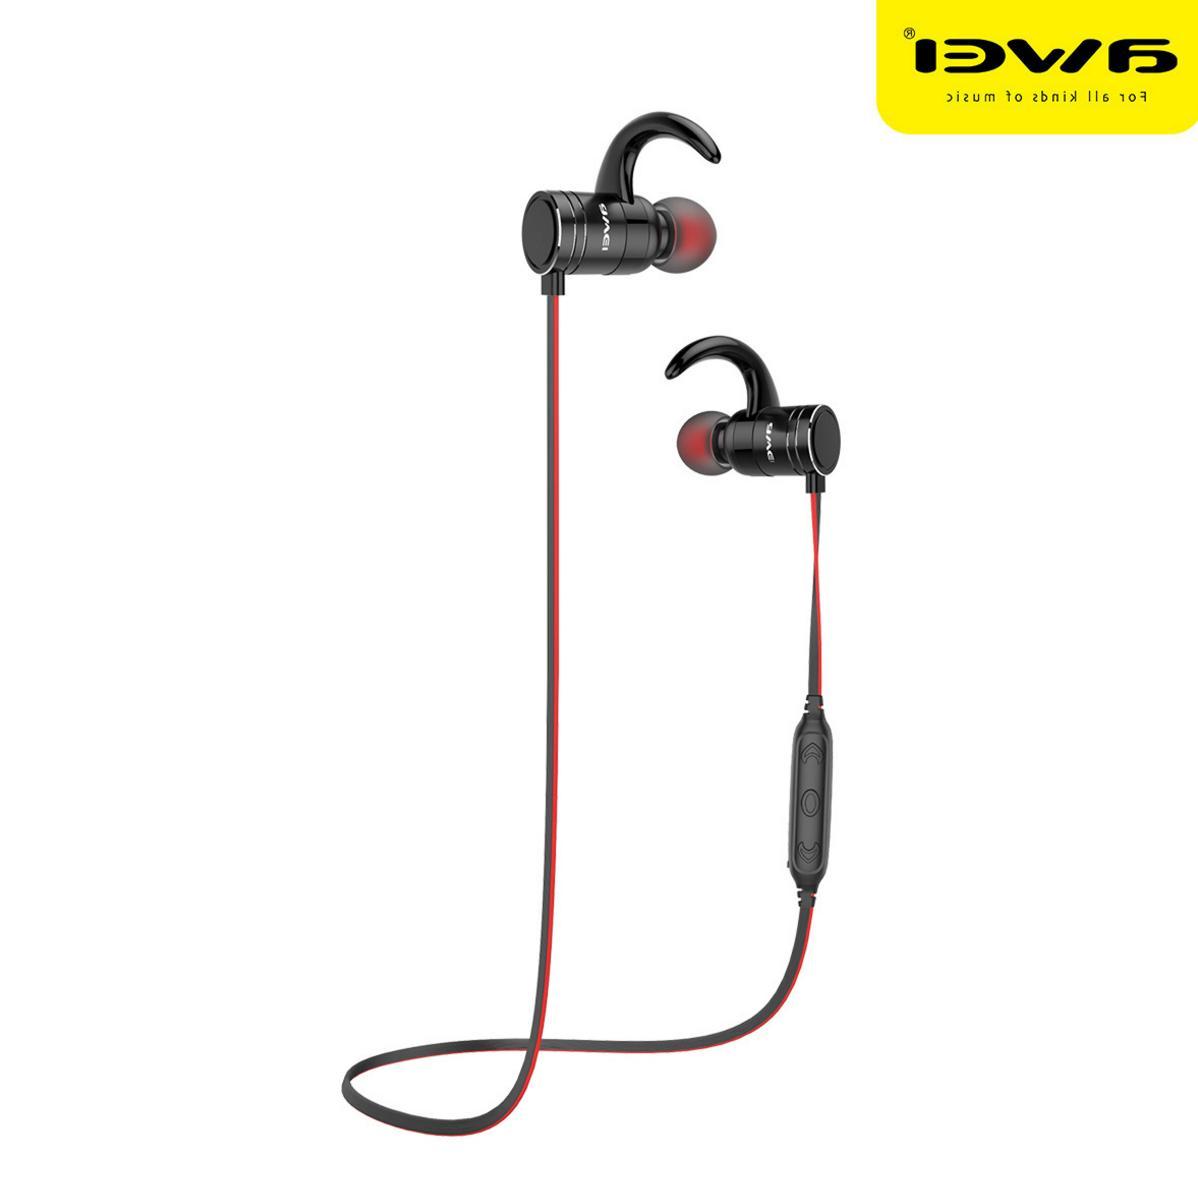 AWEI Bluetooth Stereo Earphones